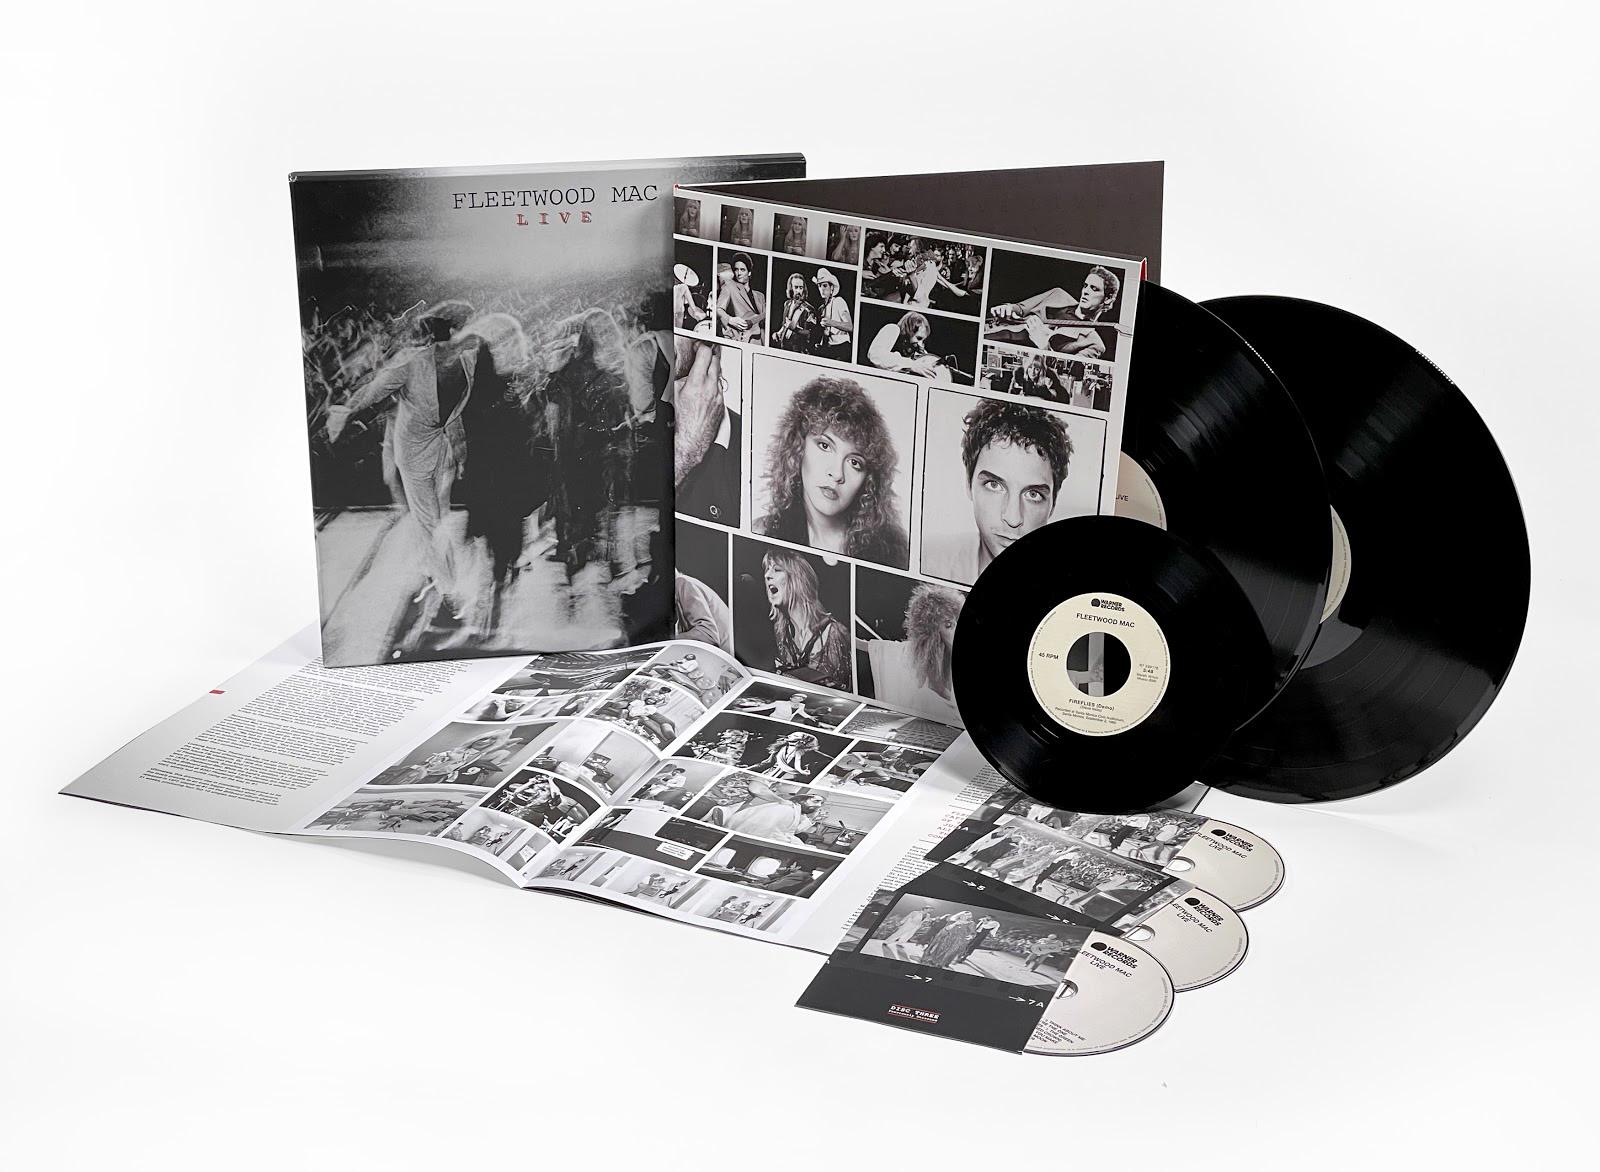 FLEETWOOD MAC - Live Super Deluxe Announced - Hear Unreleased Live Version Of 'The Chain'